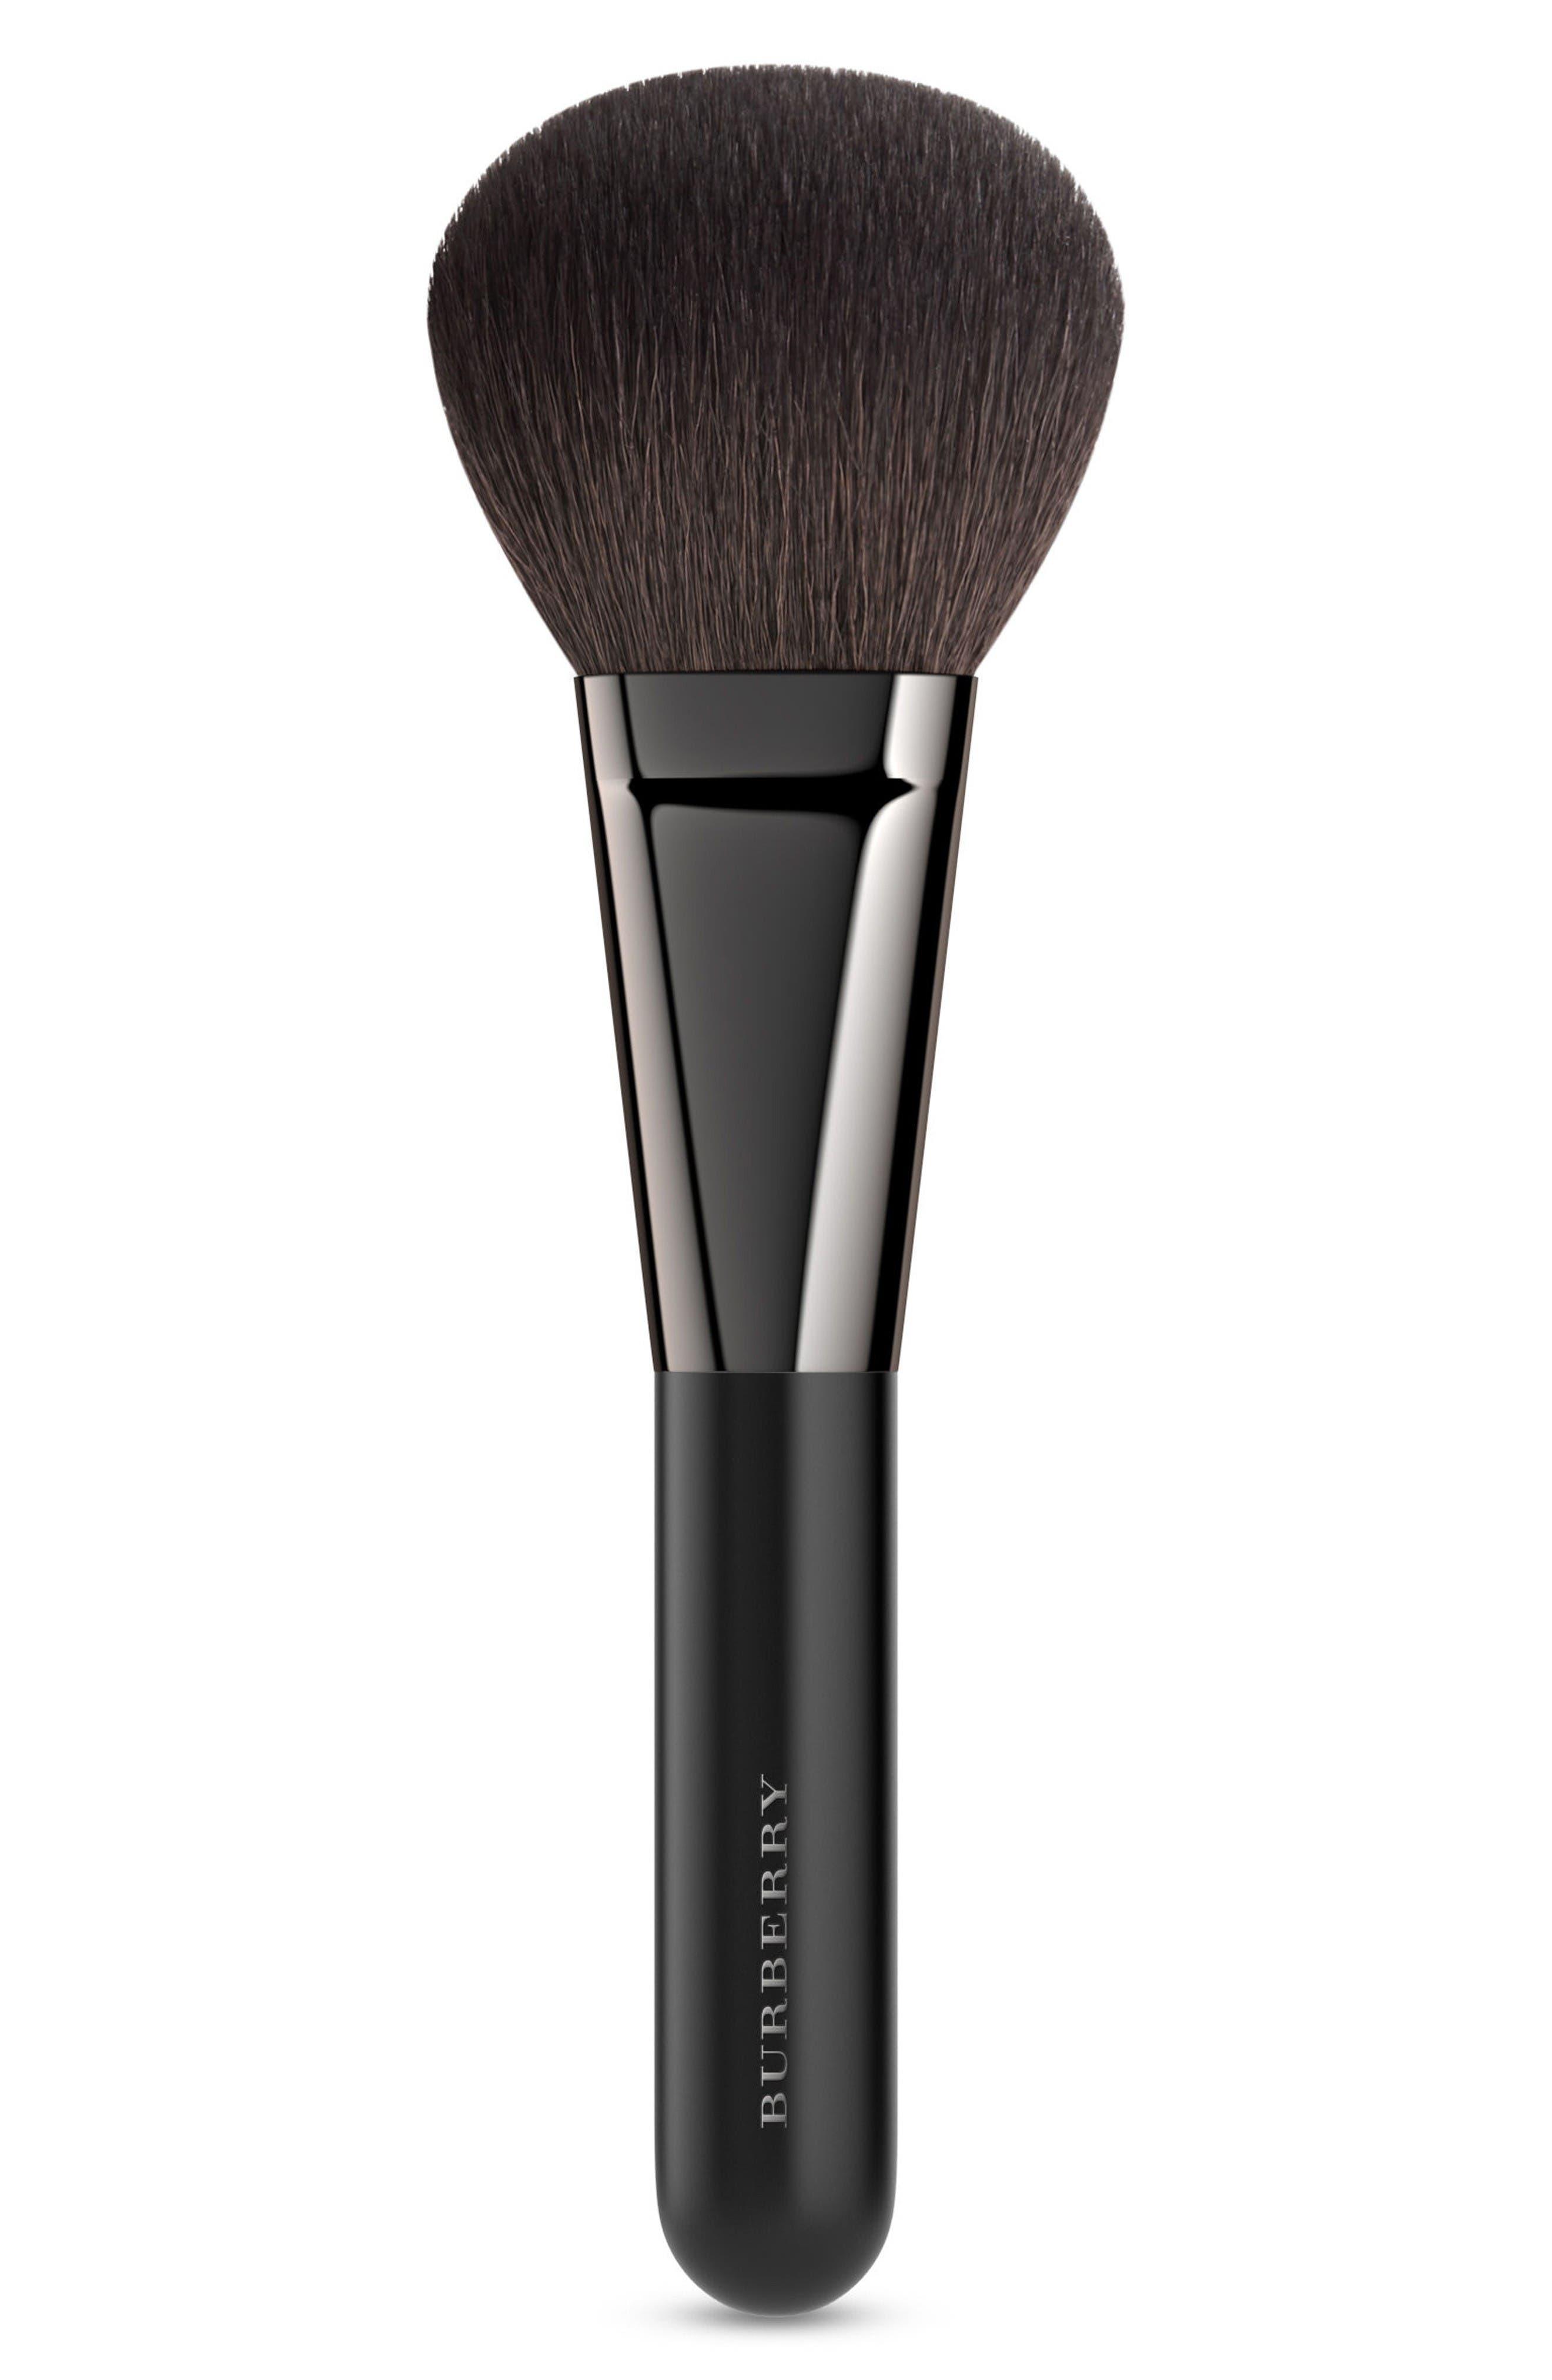 Burberry Beauty Powder Brush No. 1